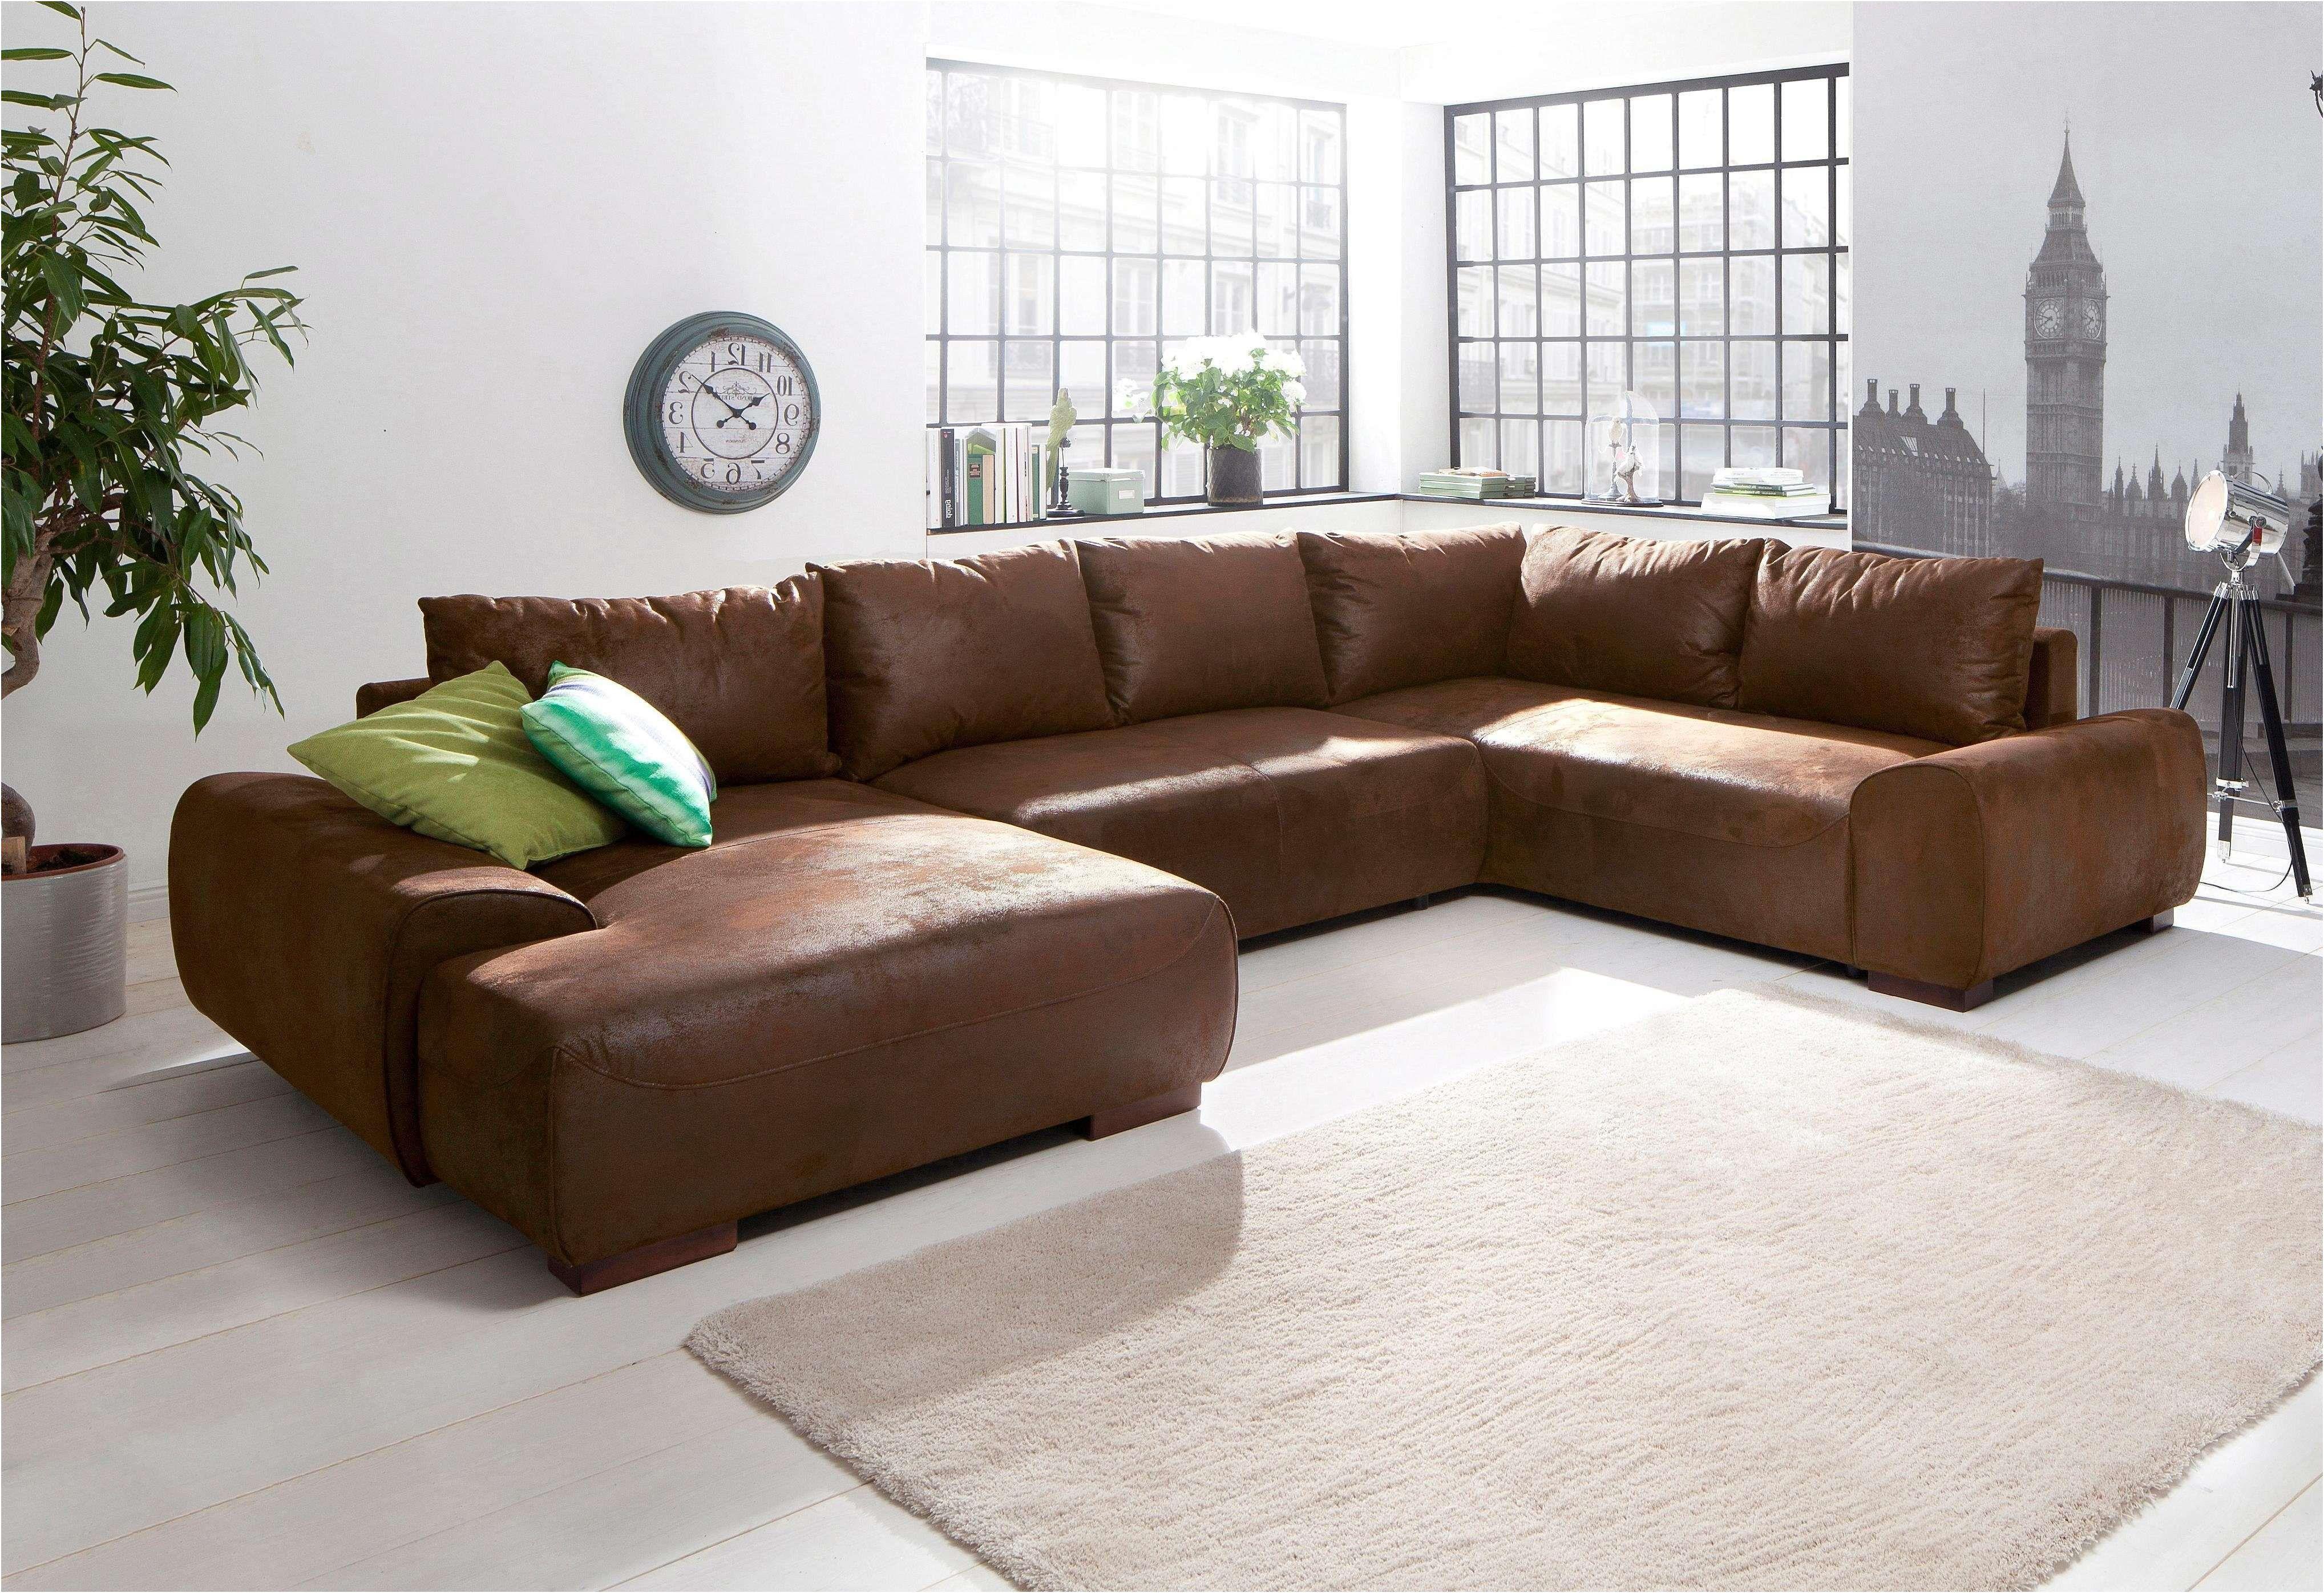 Neu Otto Wohnzimmer sofa